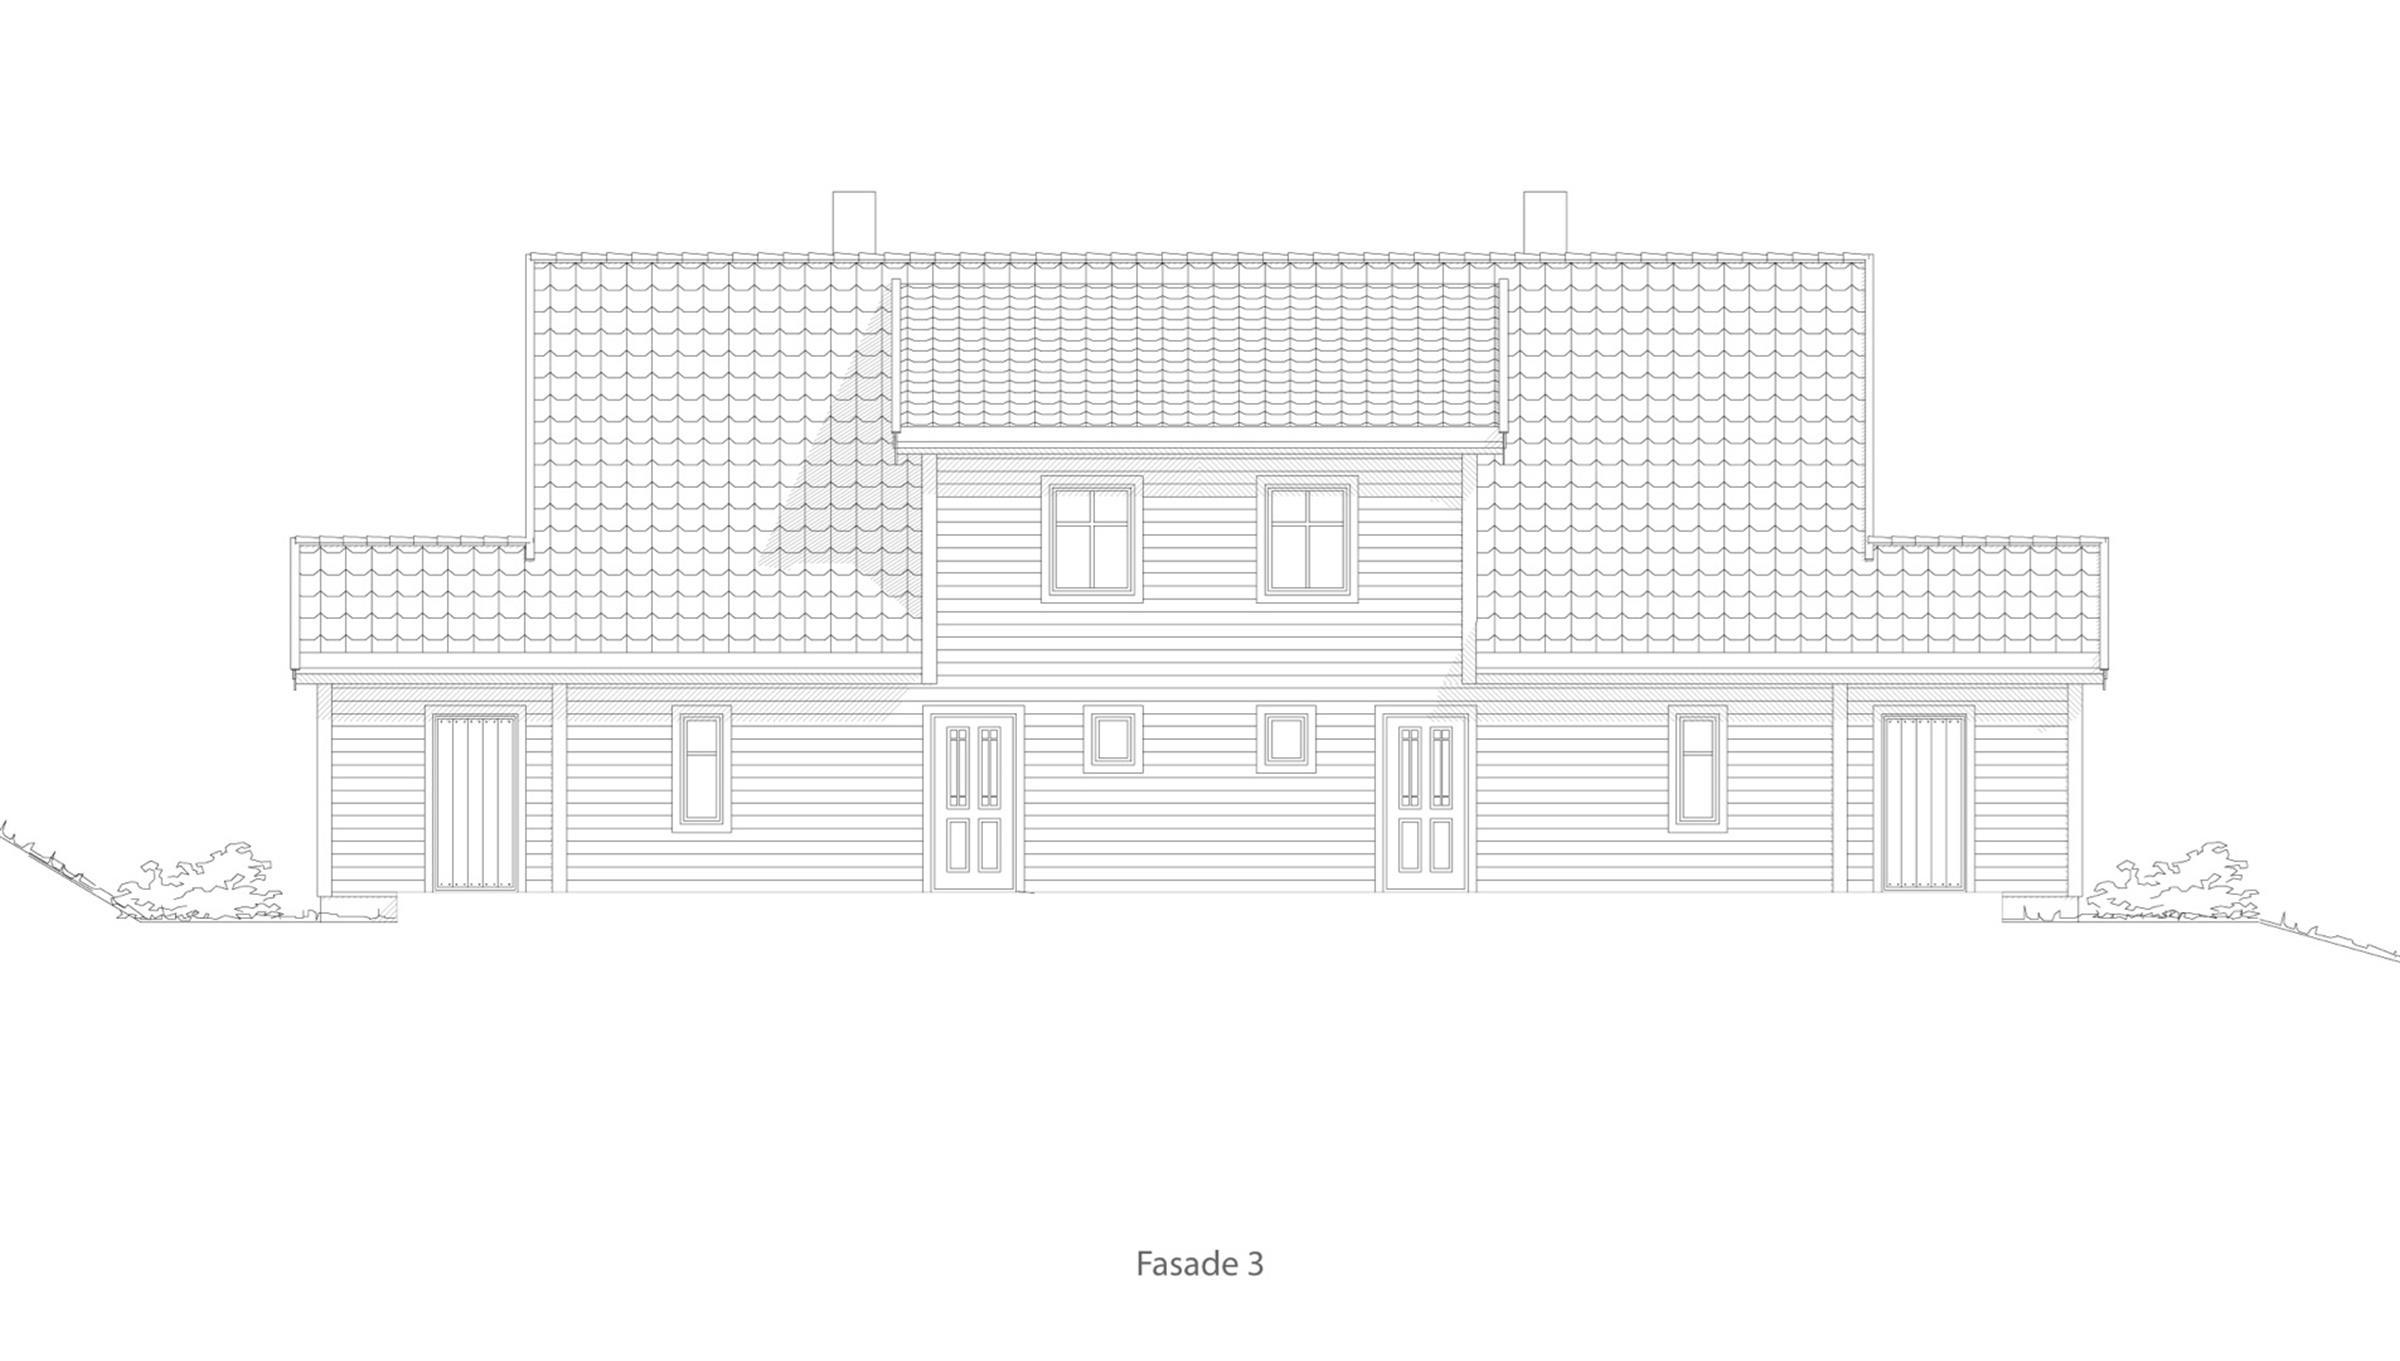 Elverum fasade 3